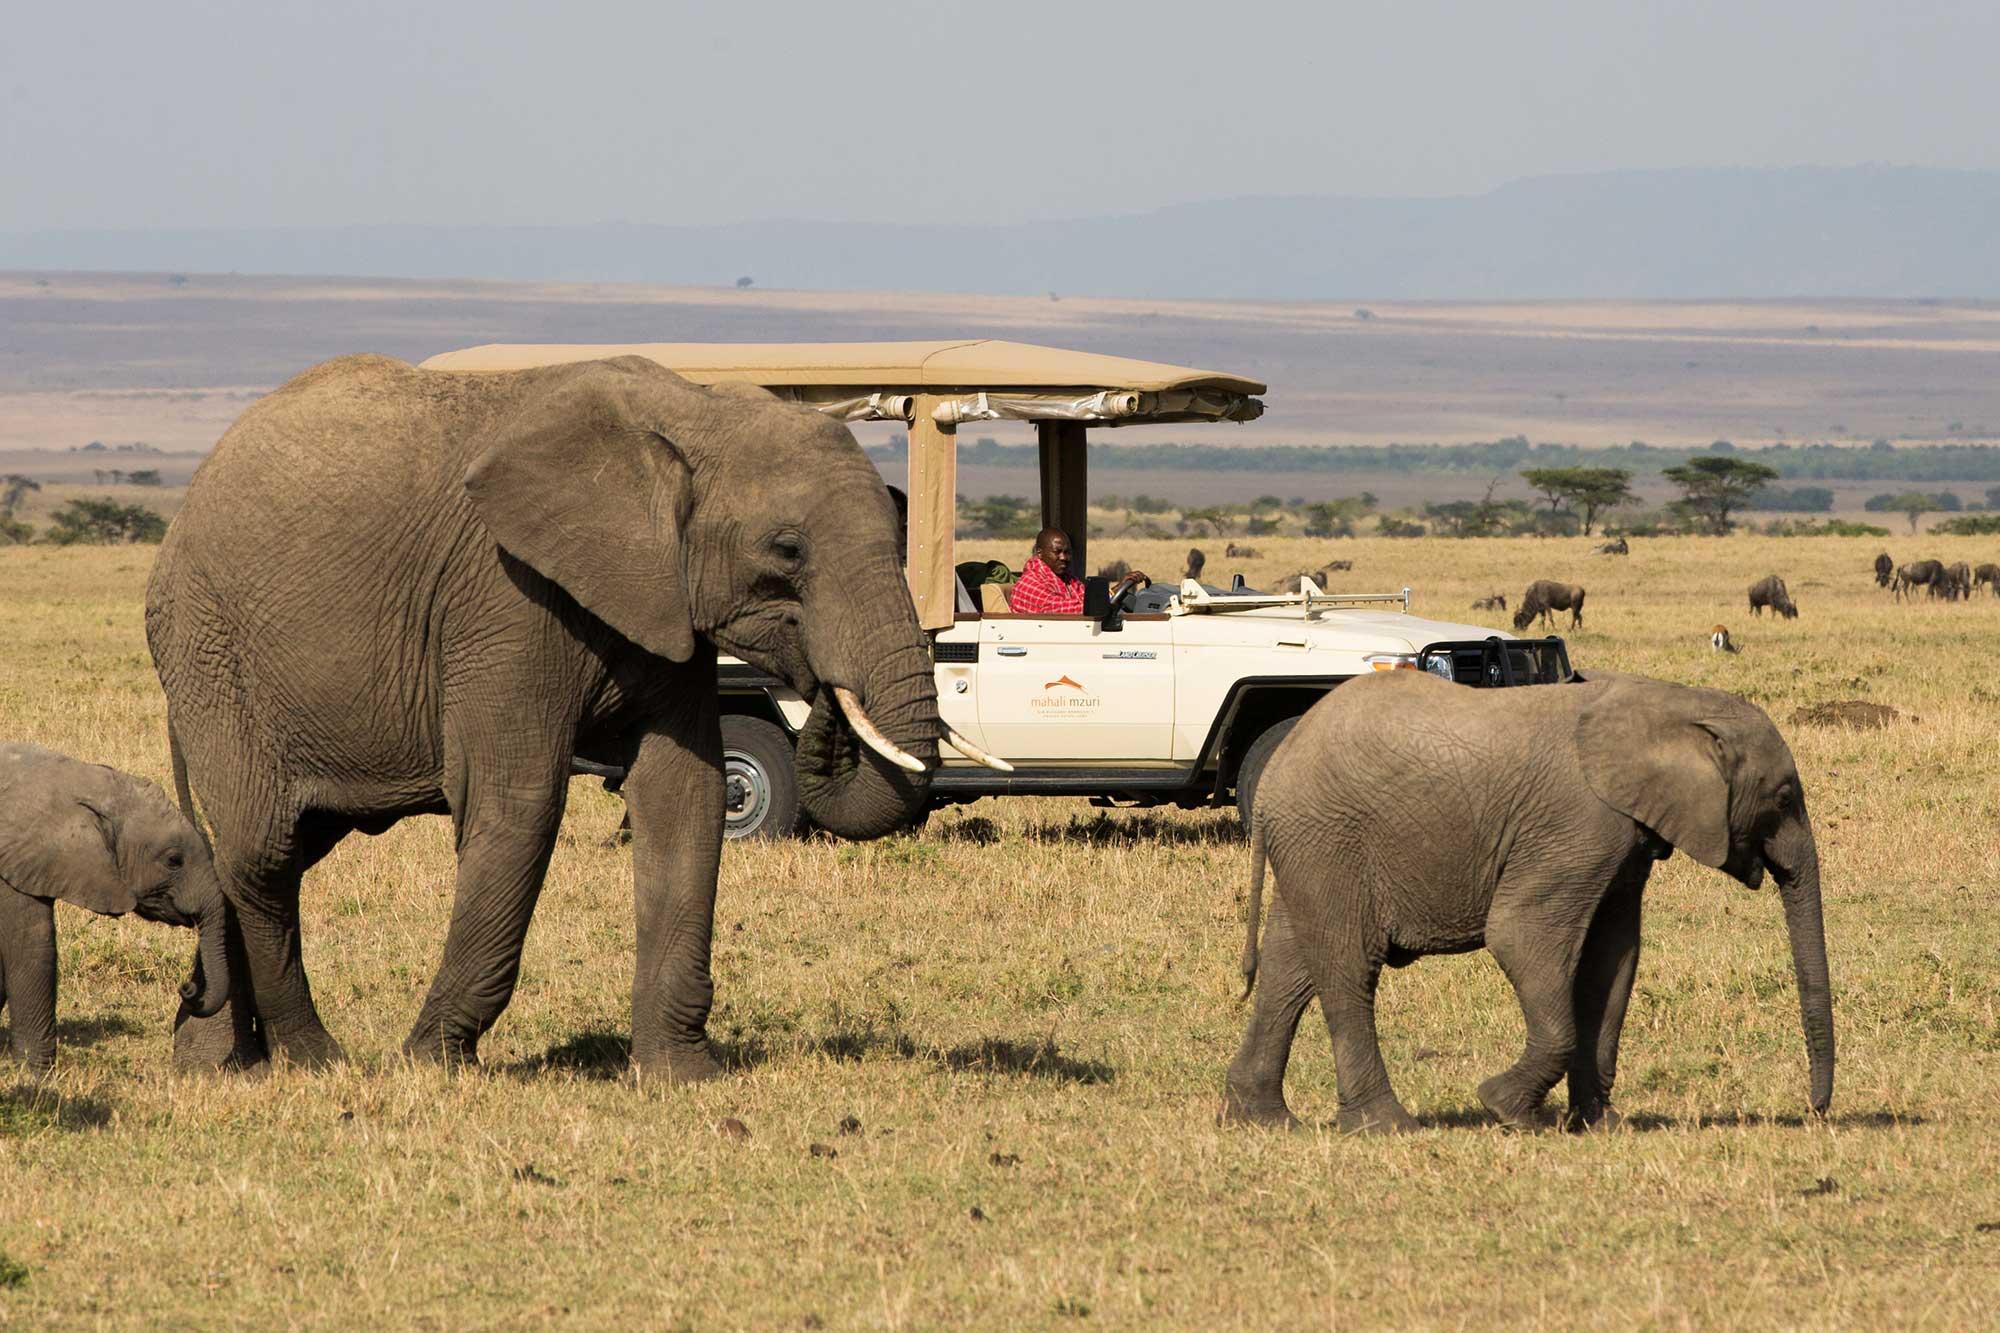 mahali-mzuri-game-vehicle-elephants